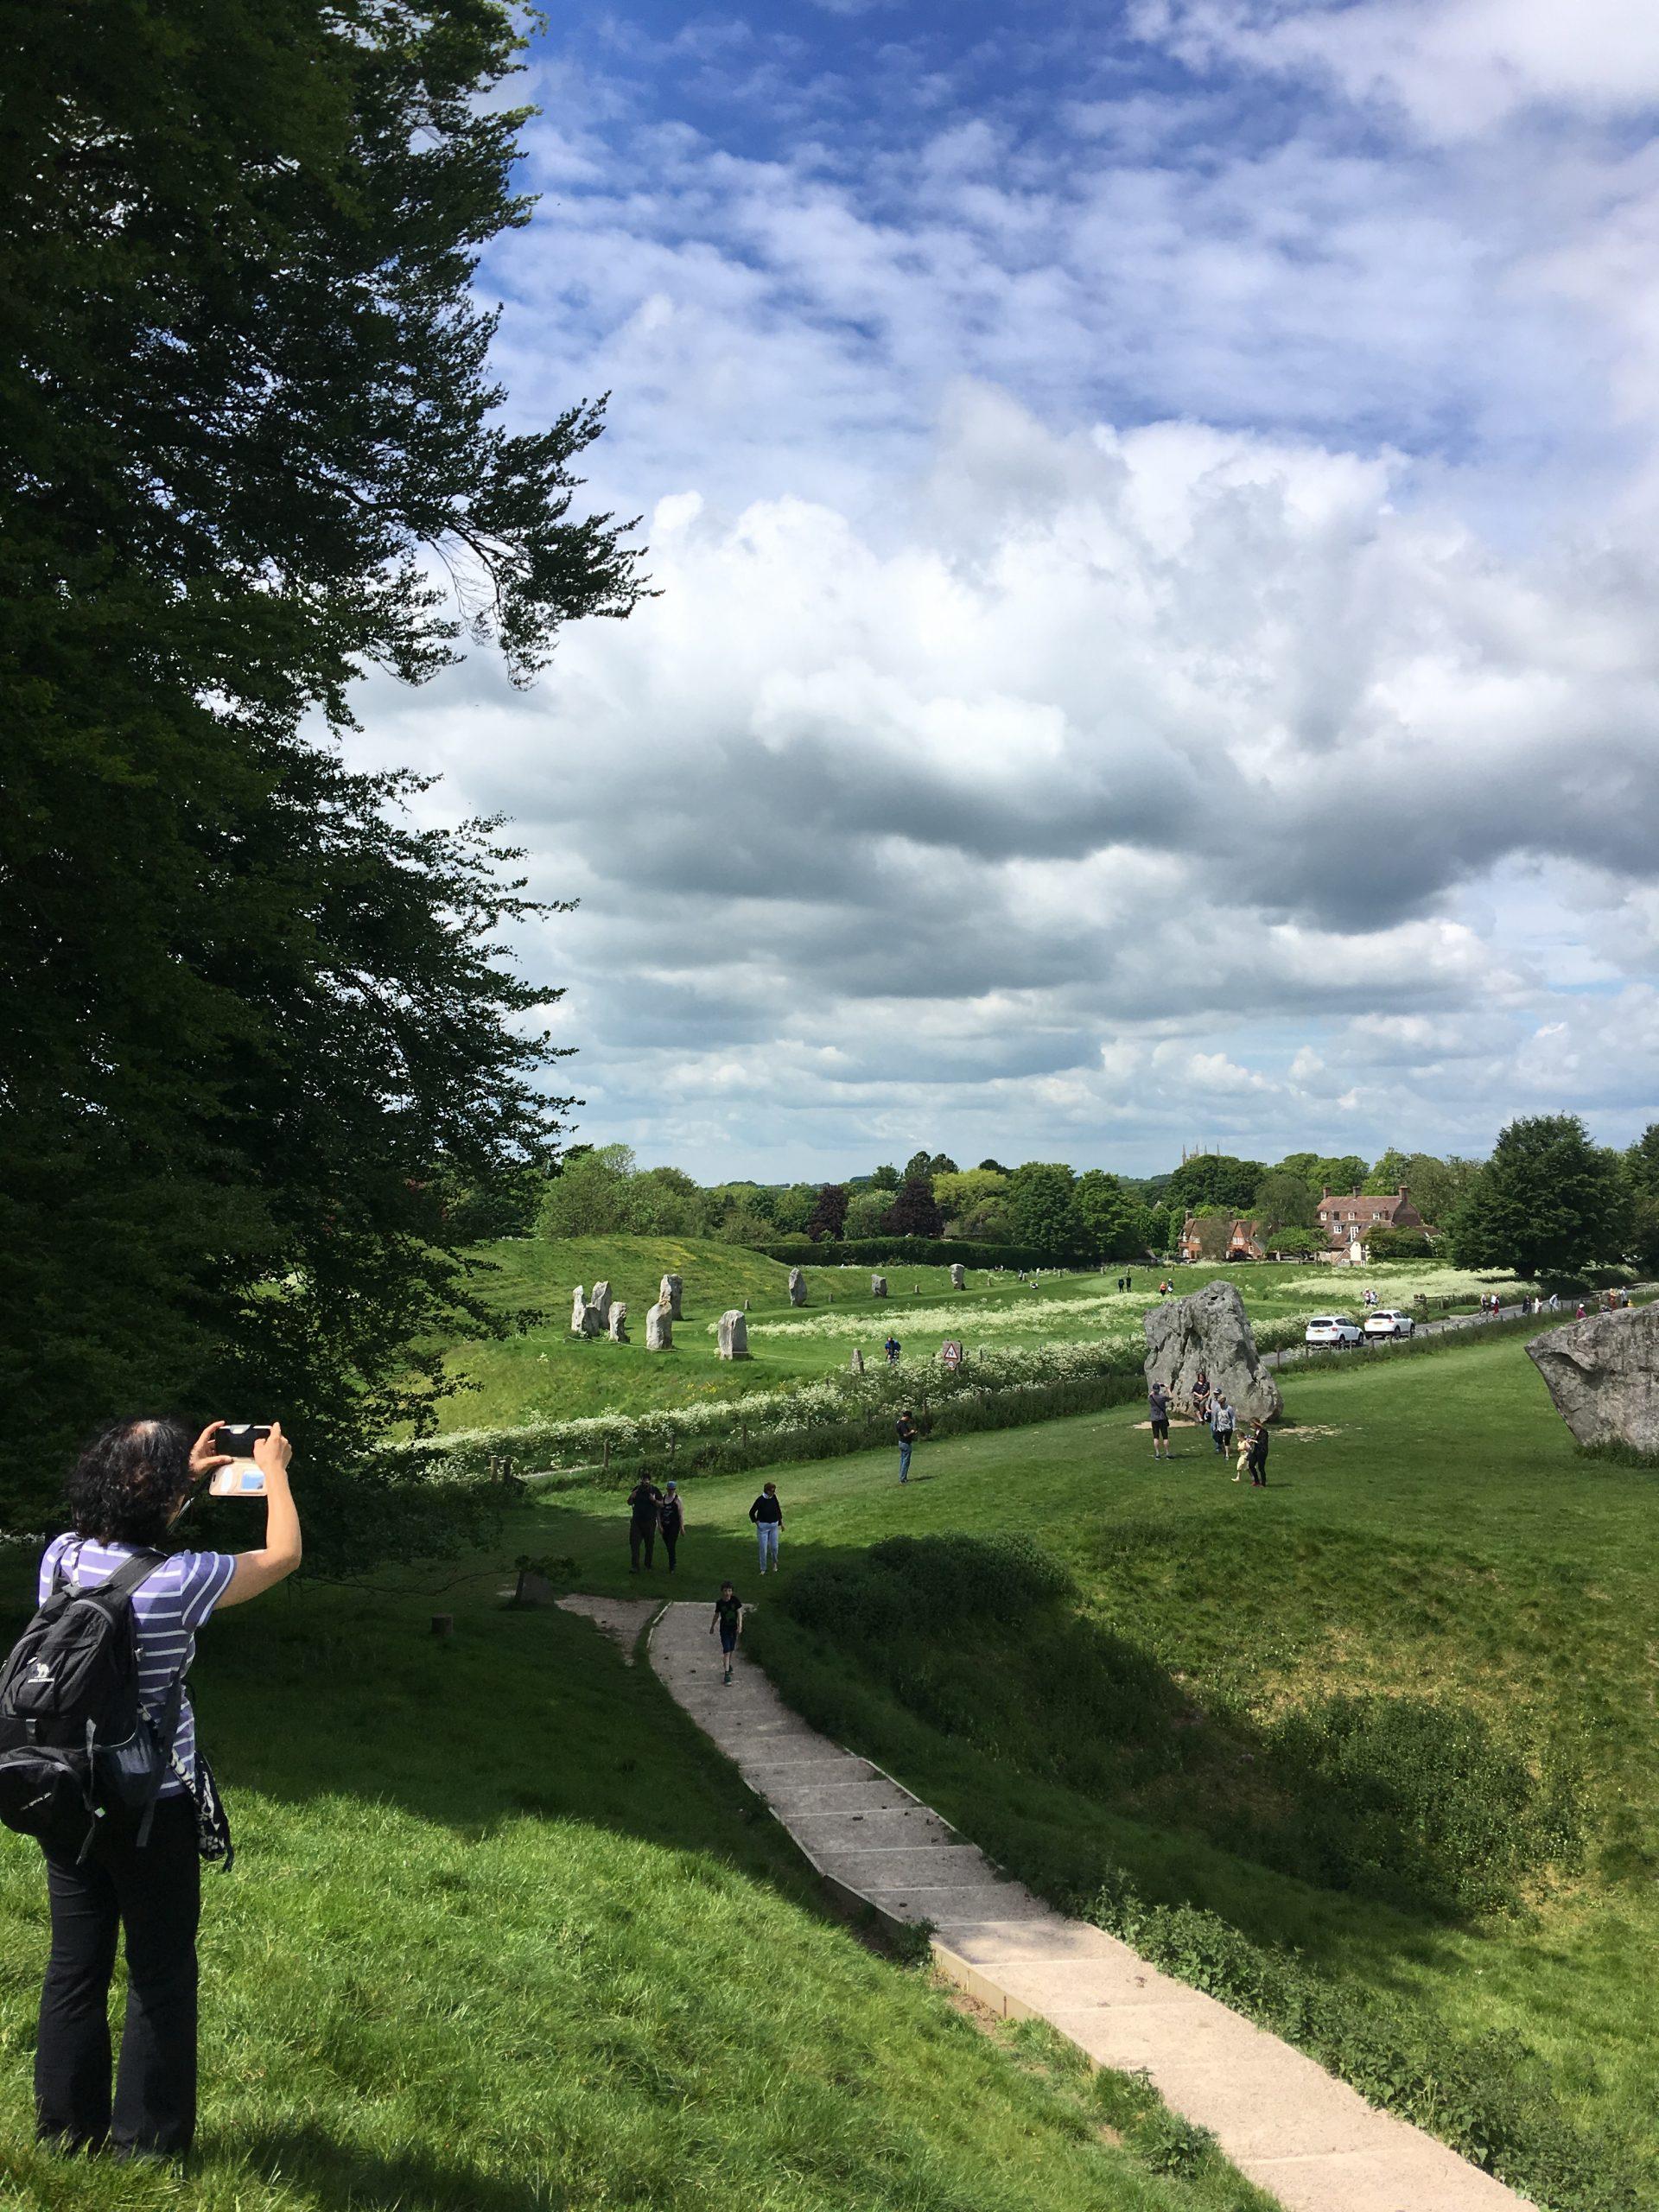 On the bank at Avebury on an Avebury Stone Circle tour